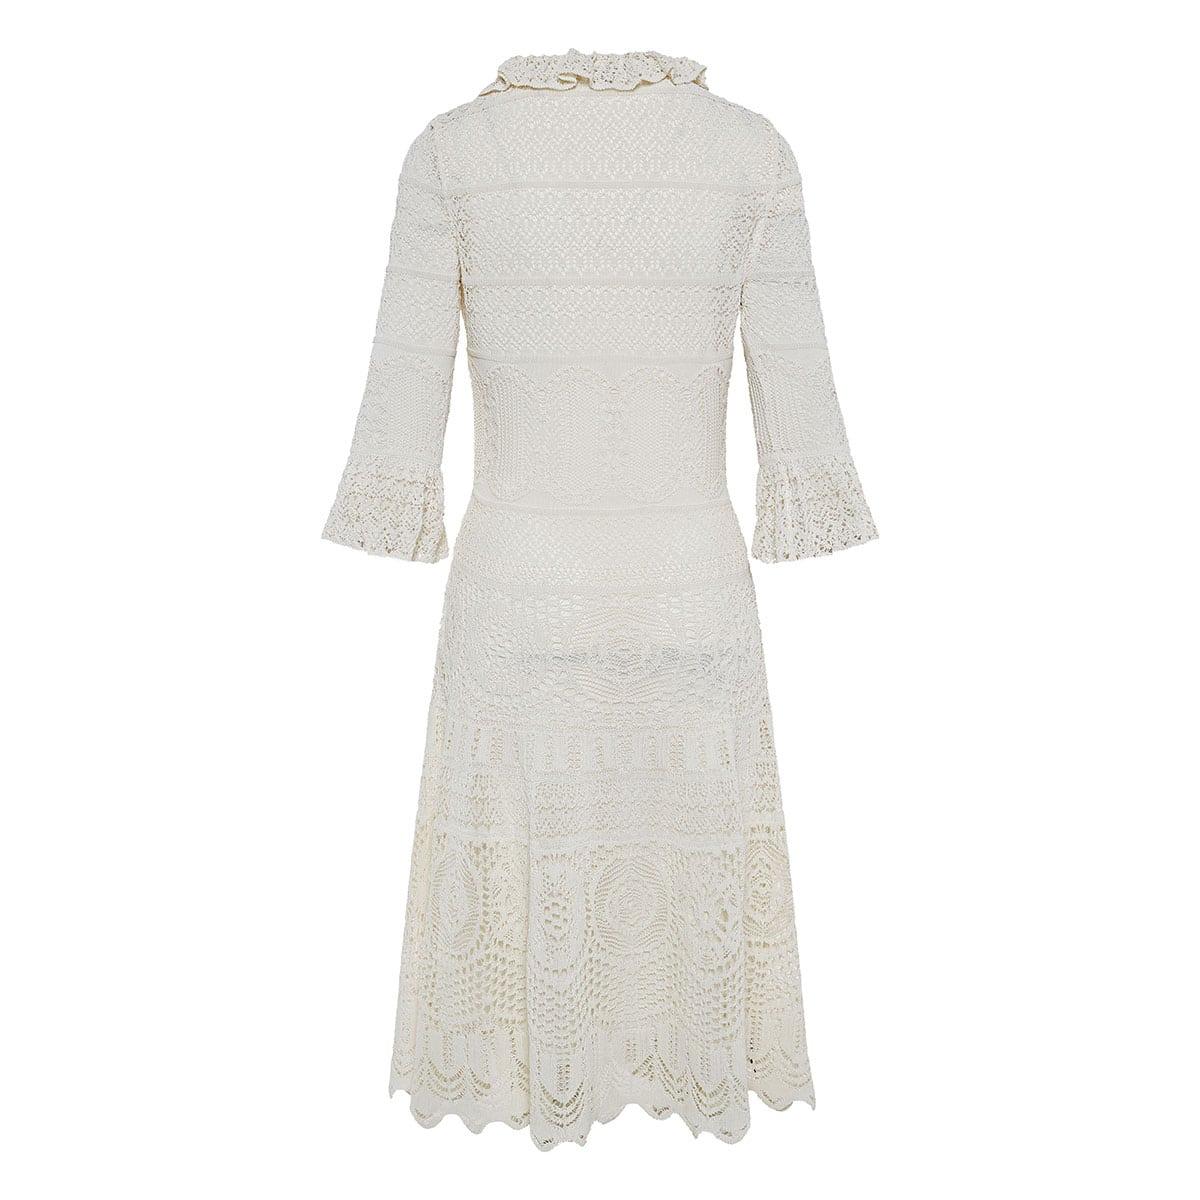 Lace-knitted midi dress